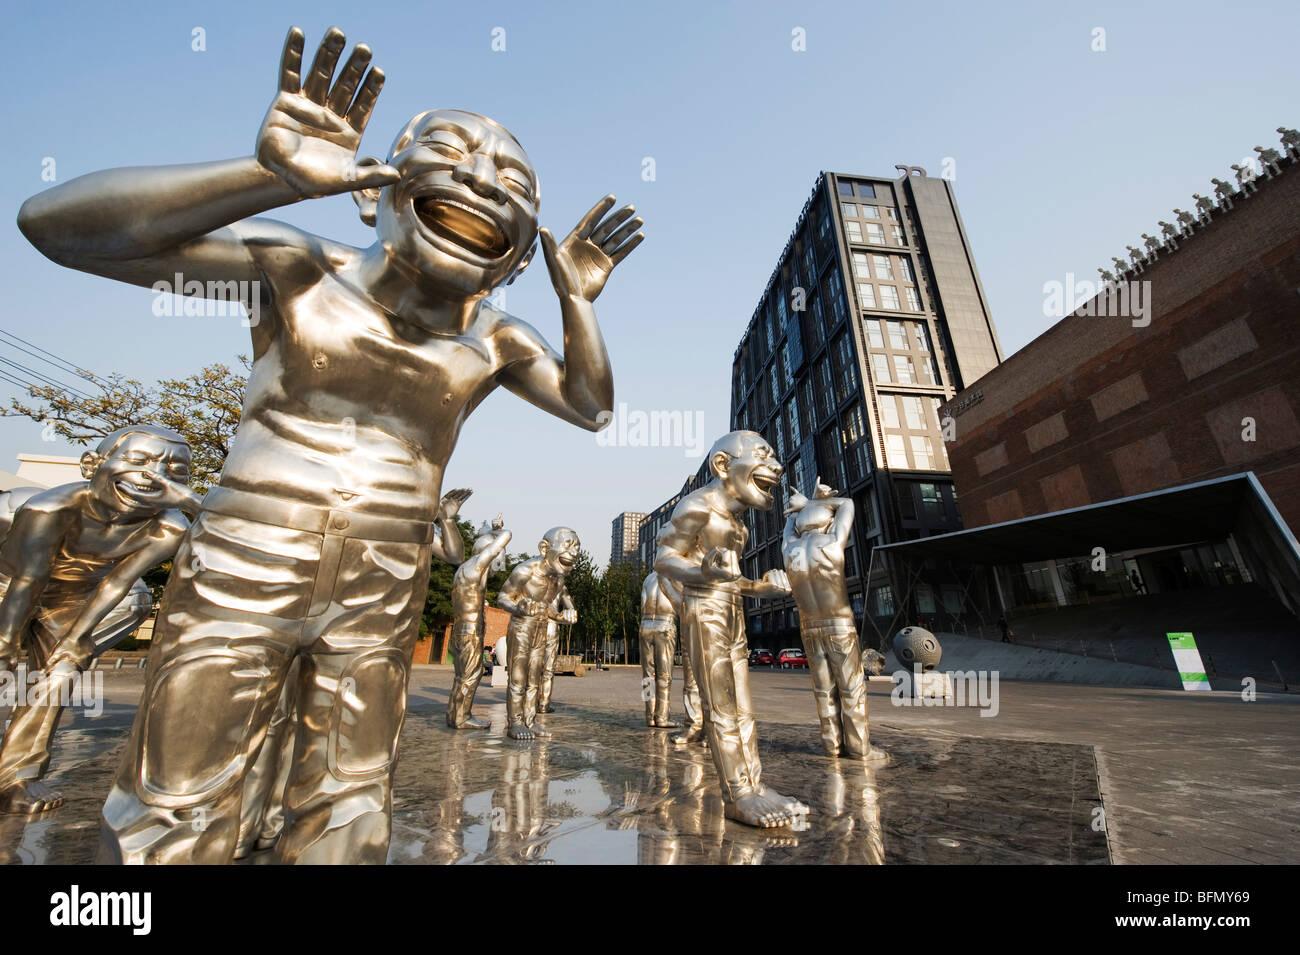 Risultati immagini per TODAY ART MUSEUM PECHINO ?